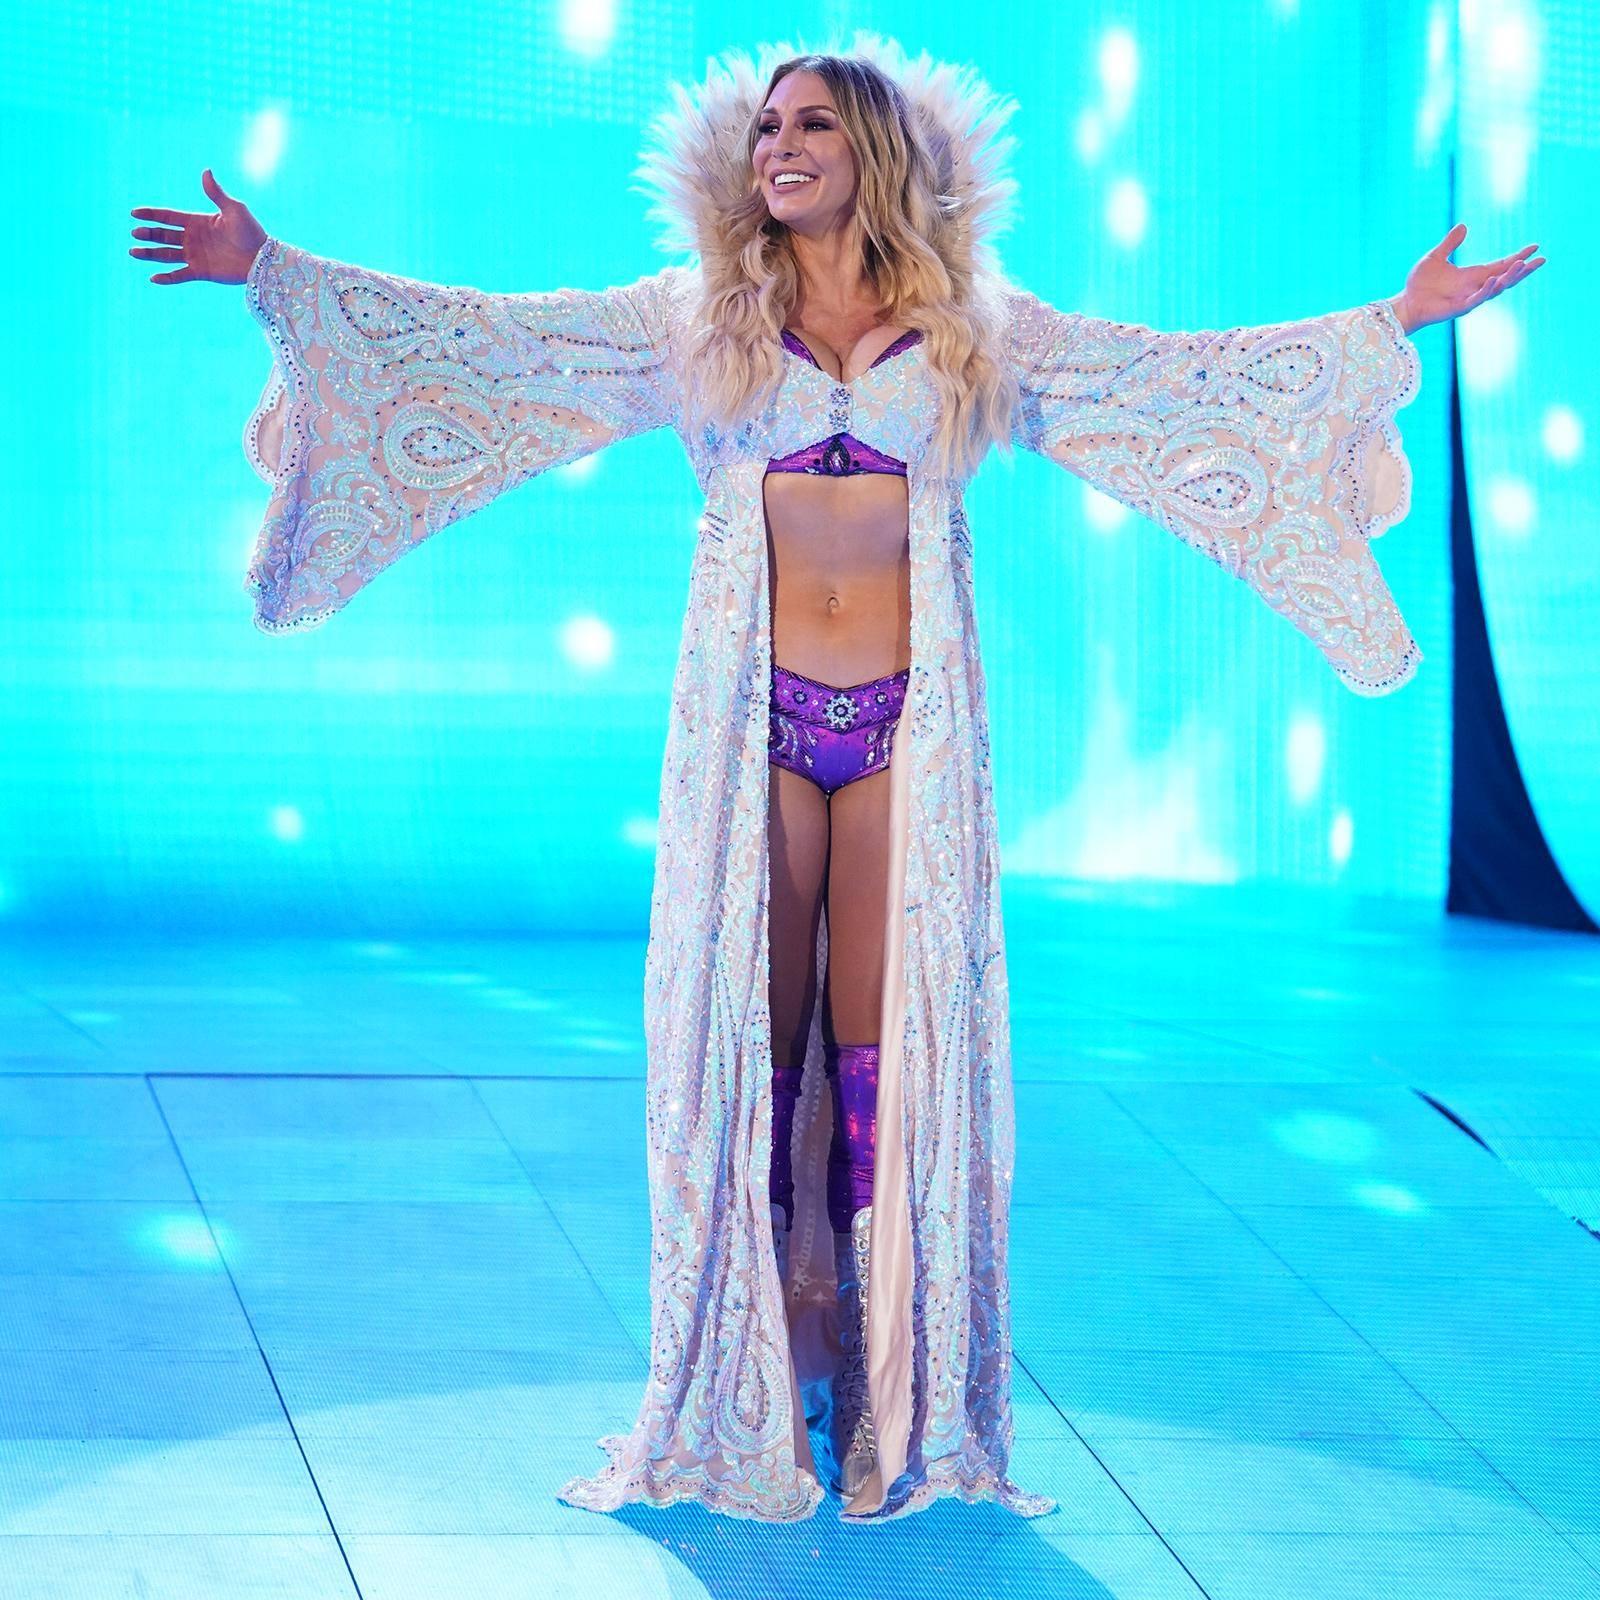 Charlotte Flair en WrestleMania 35